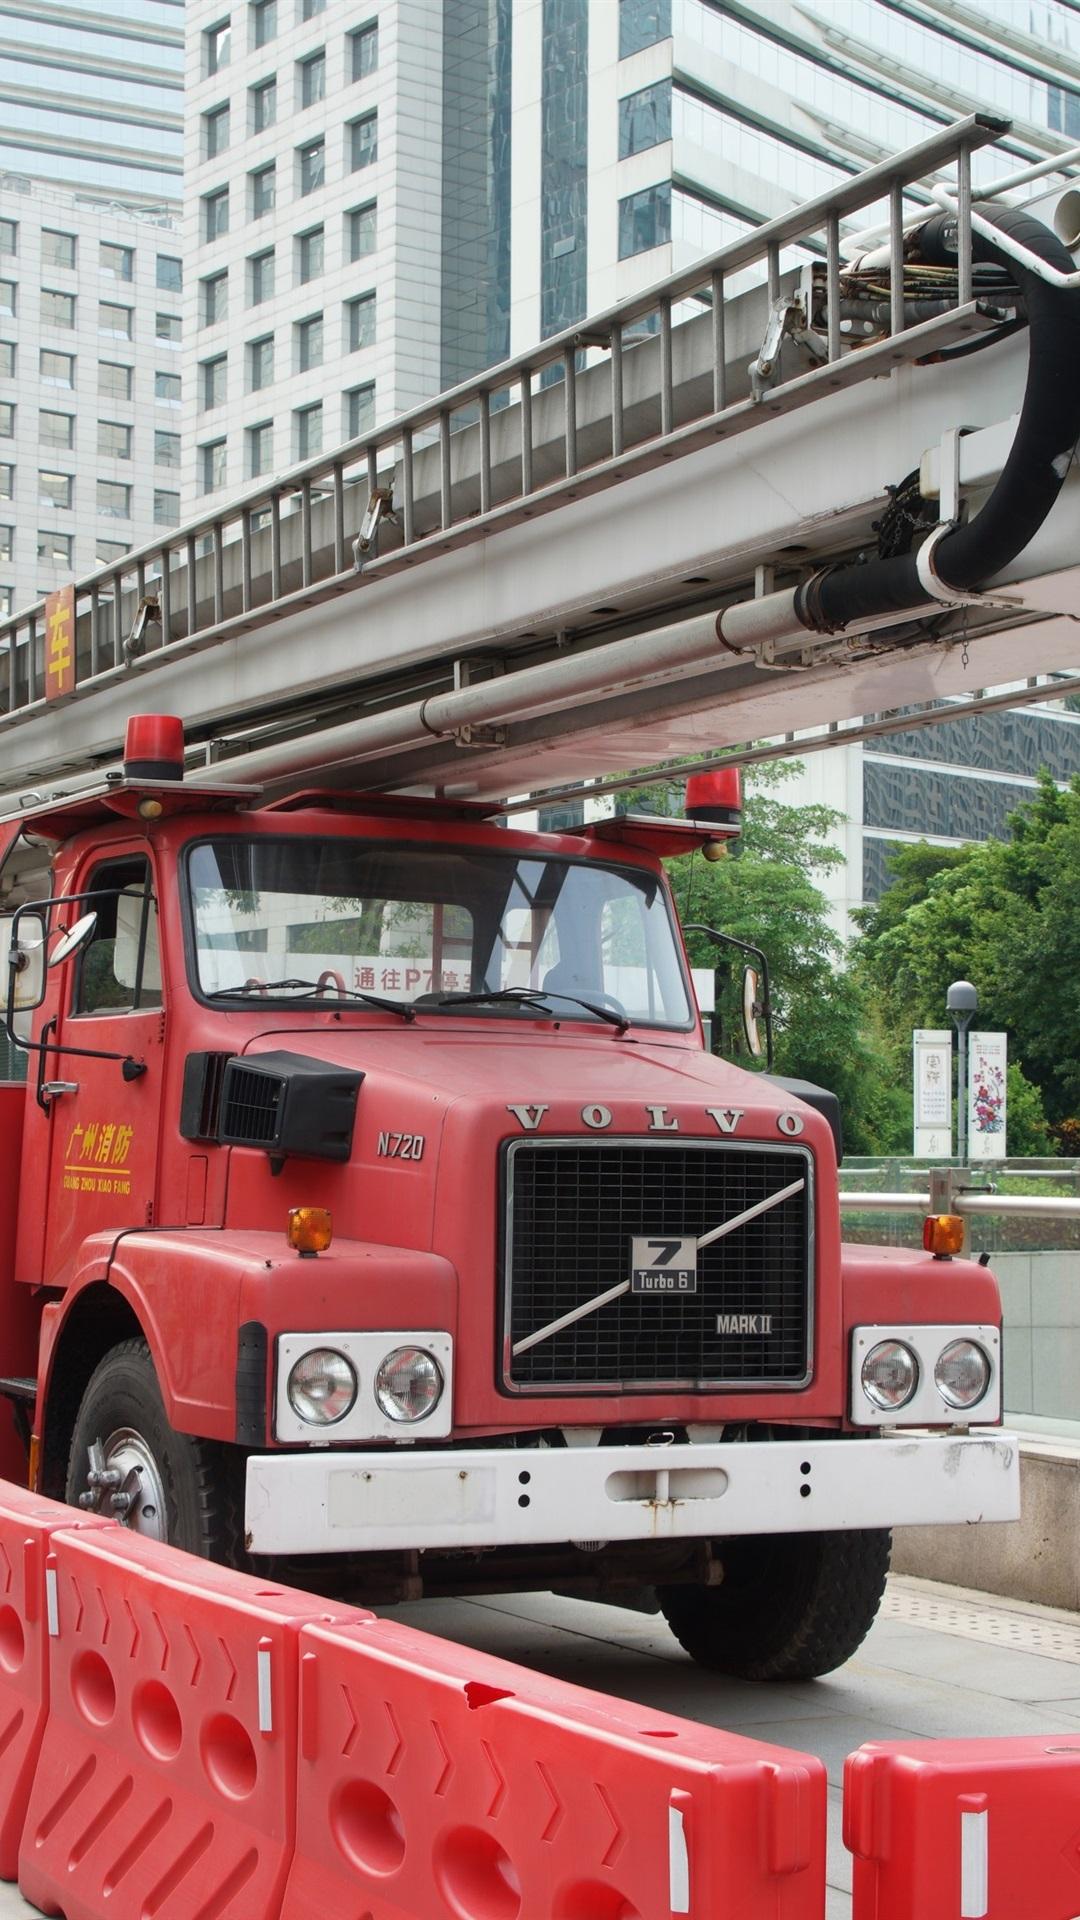 Volvo N720 Fire Truck 1080x1920 Iphone 8766s Plus